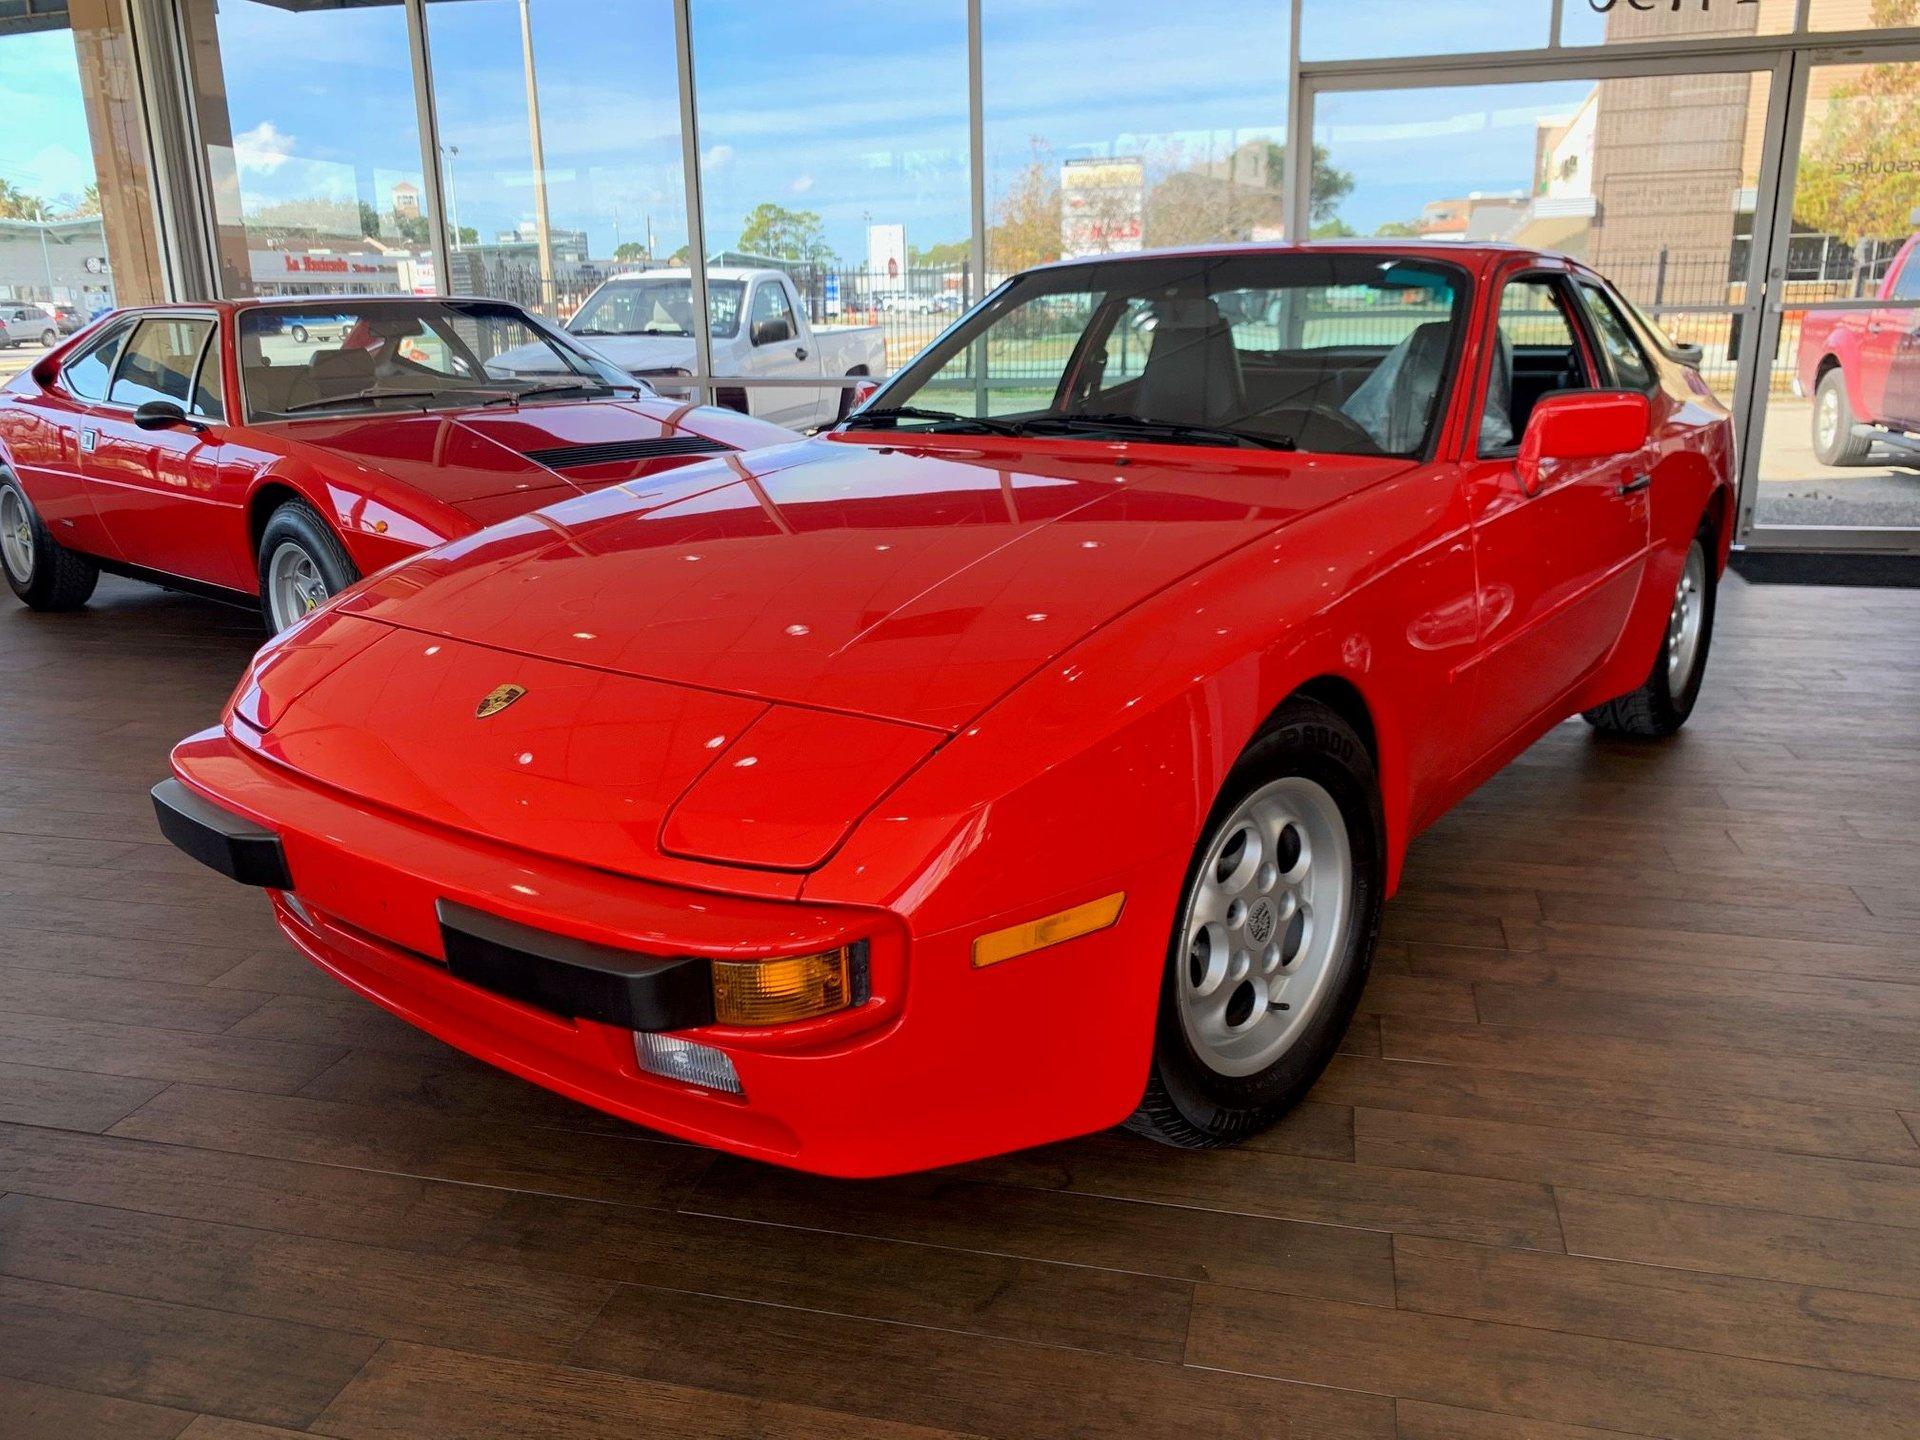 1986 porsche 944 2dr coupe 5 spd